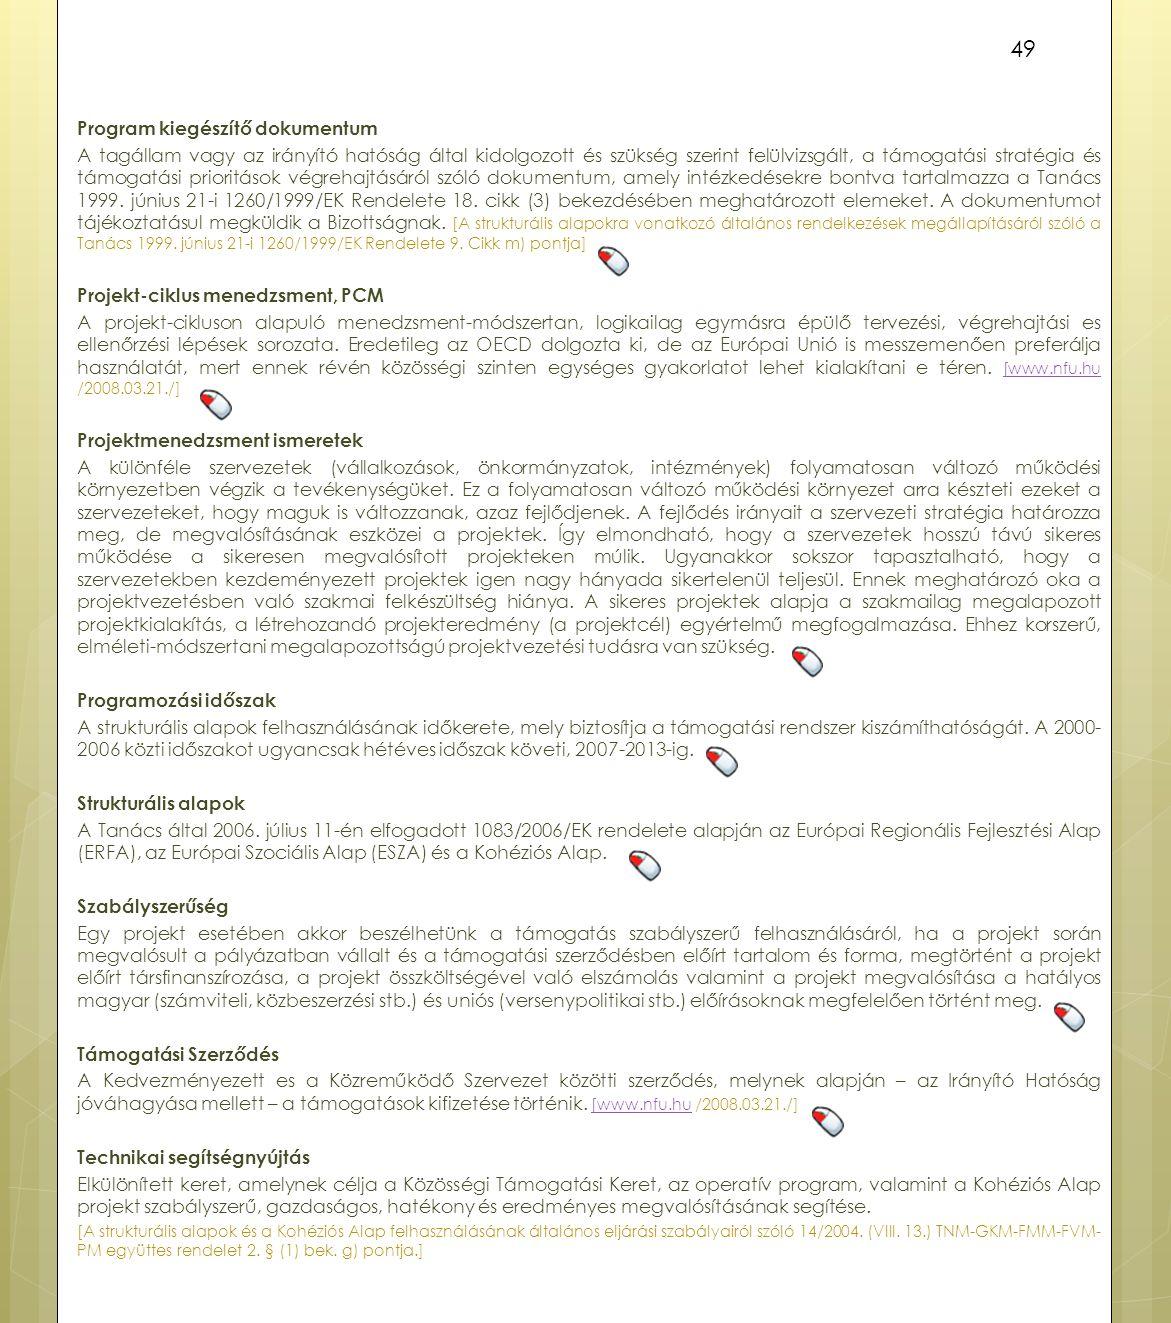 Program kiegészítő dokumentum